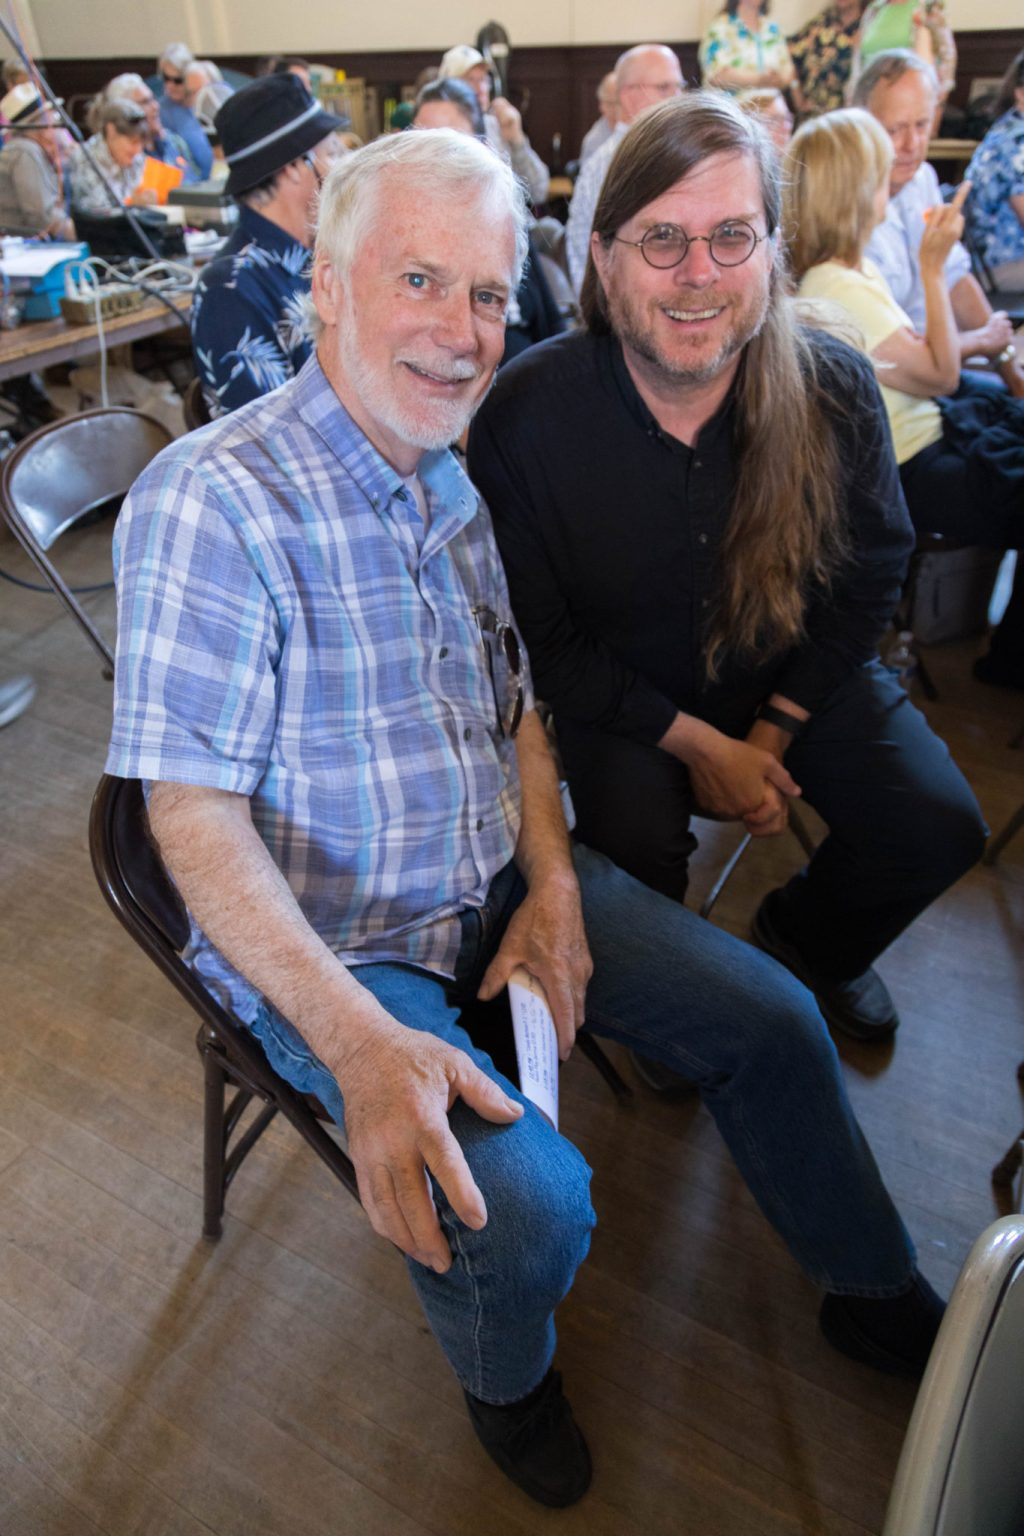 Bill Brooks and Tim pozar